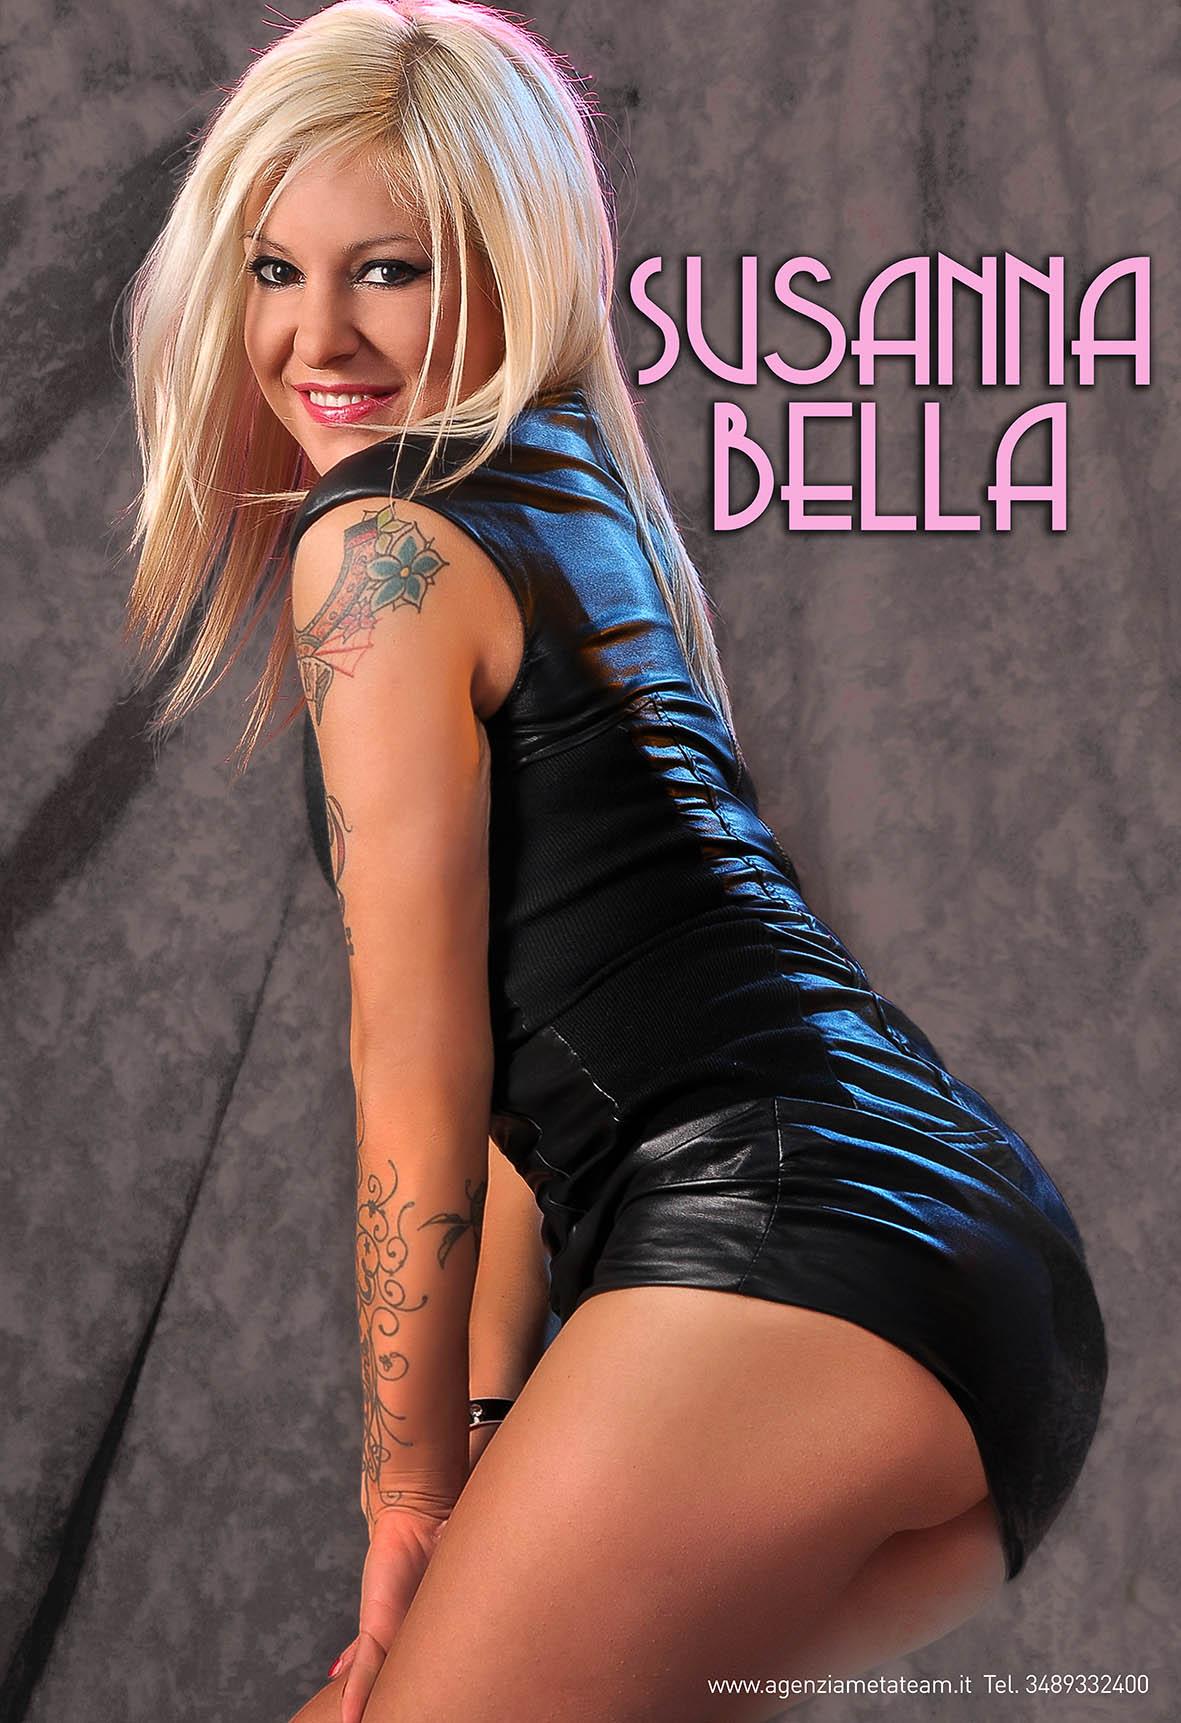 Susanna Bella 0 (1).jpg